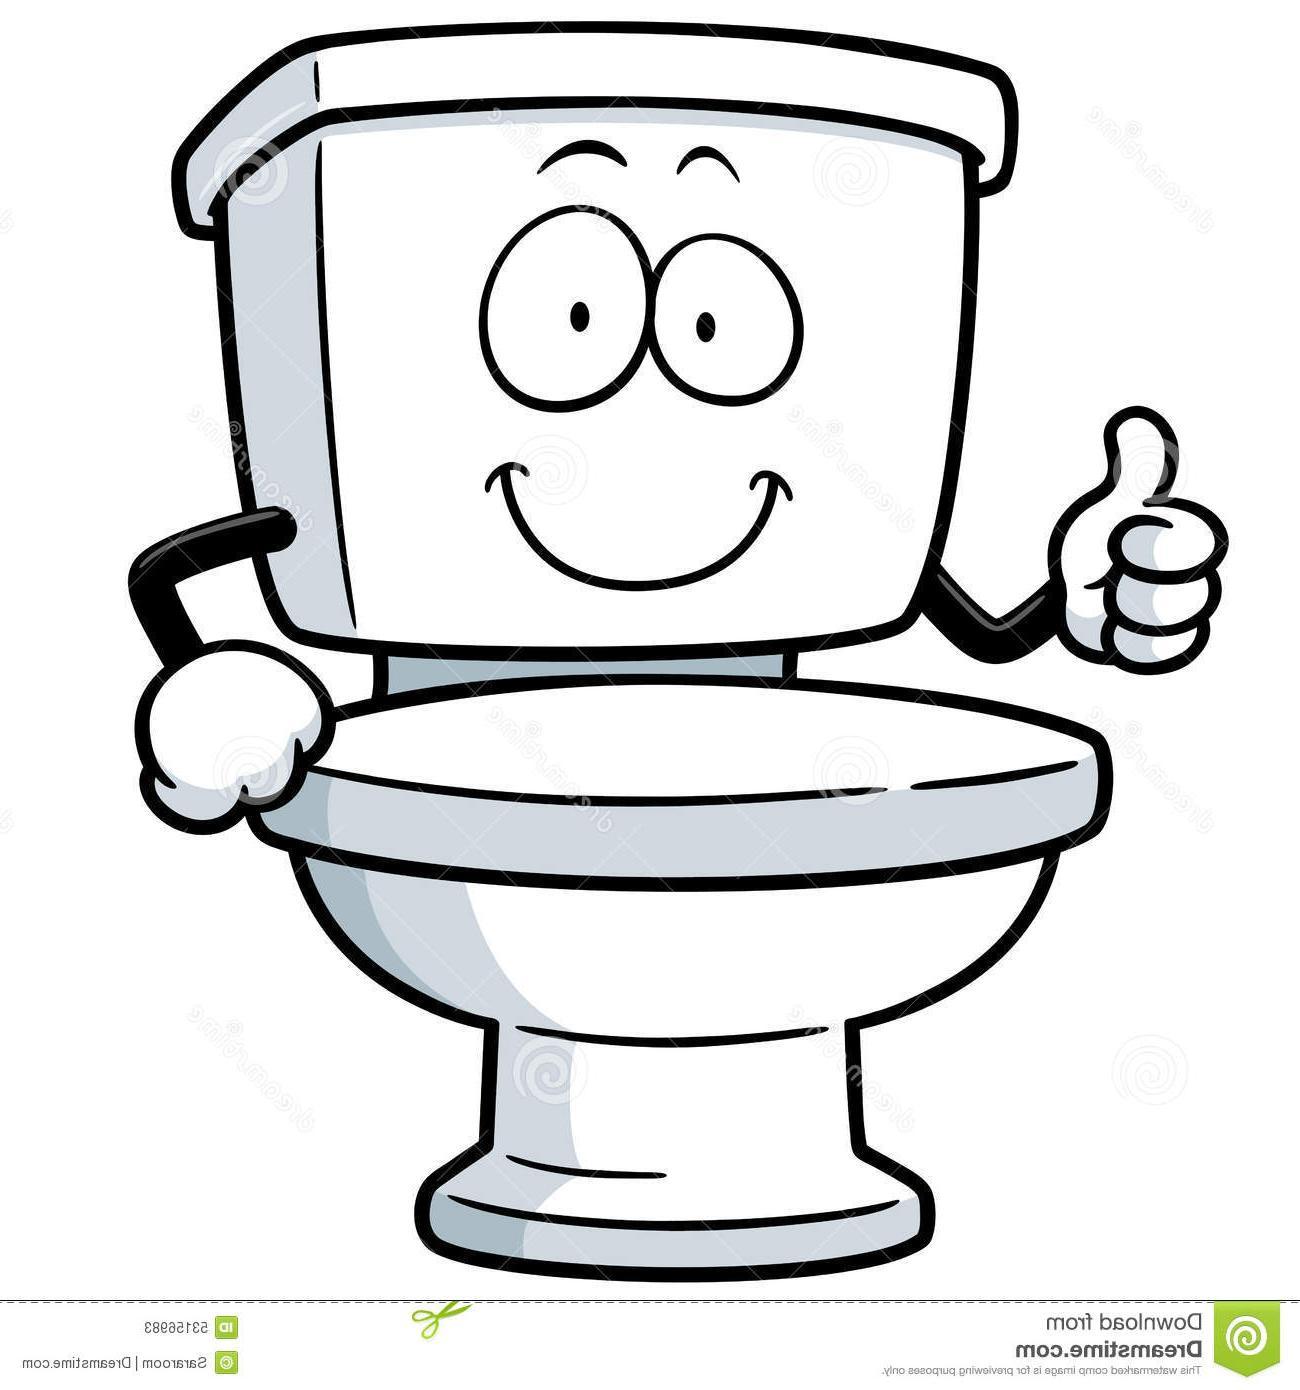 Toilets clipart banner transparent download Cartoon Toilet Clipart | Free download best Cartoon Toilet ... banner transparent download